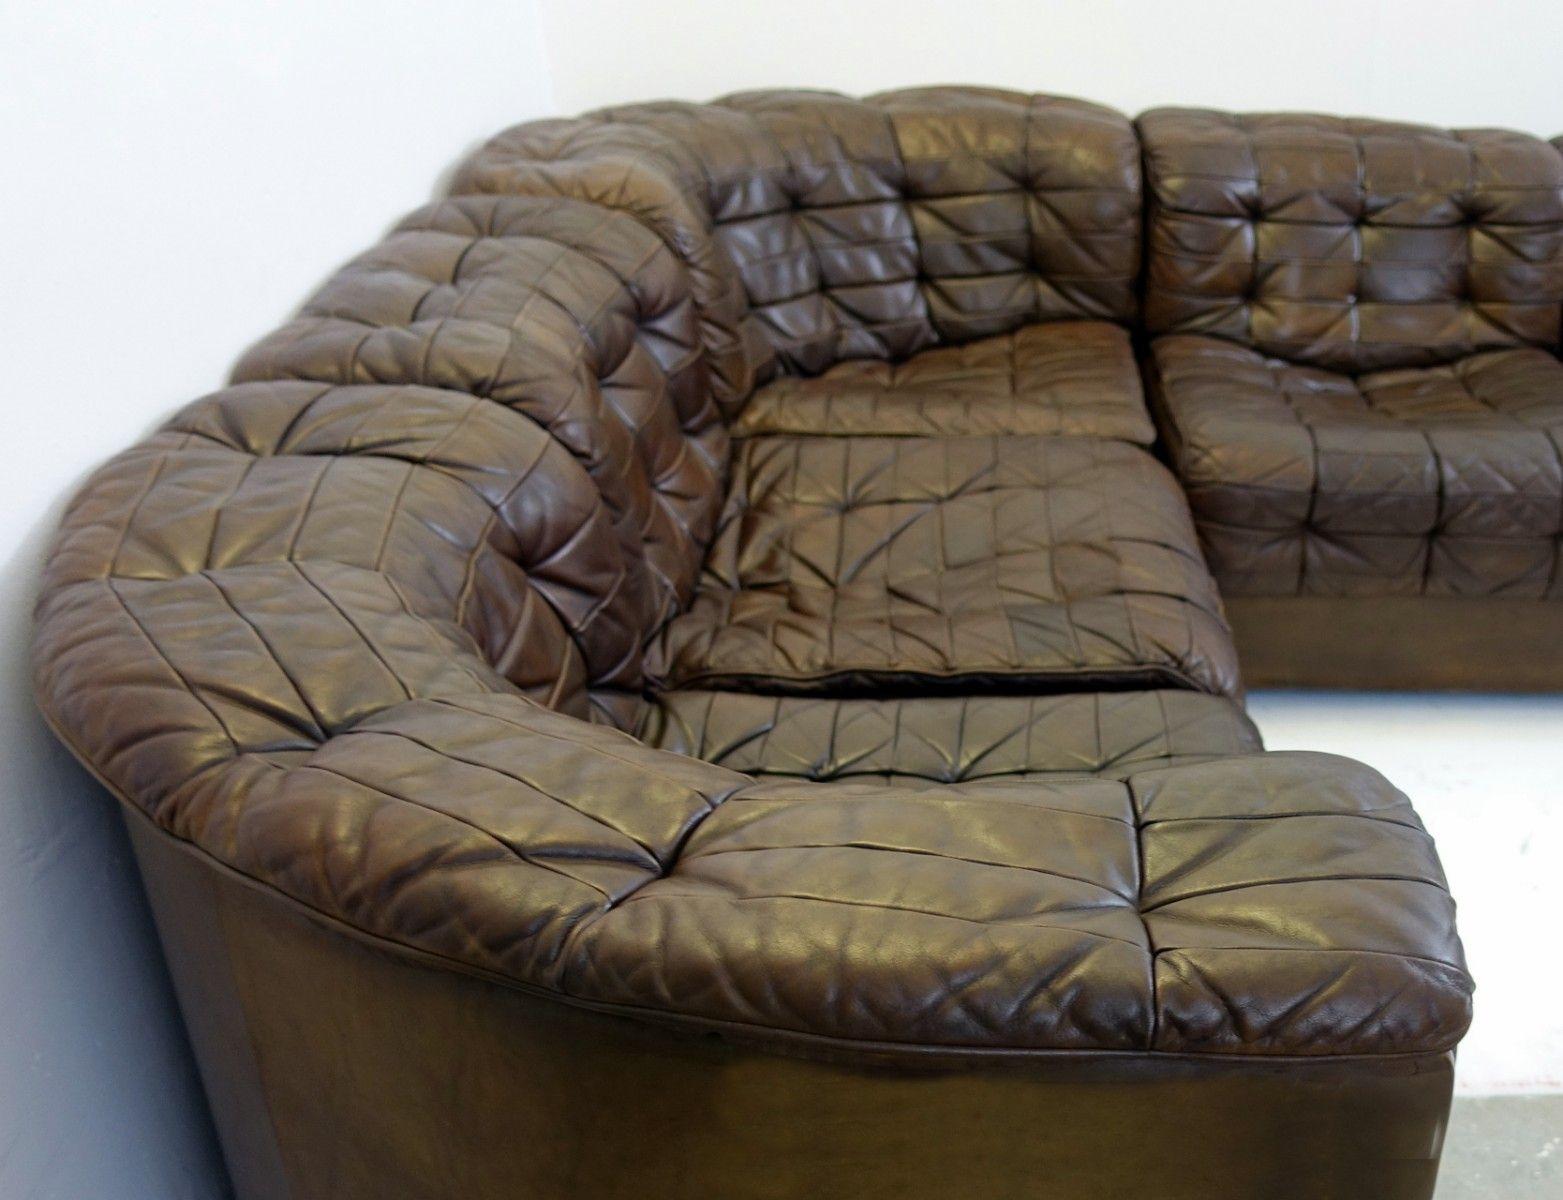 Blickfang Sofa Patchwork Referenz Von €4,700.00